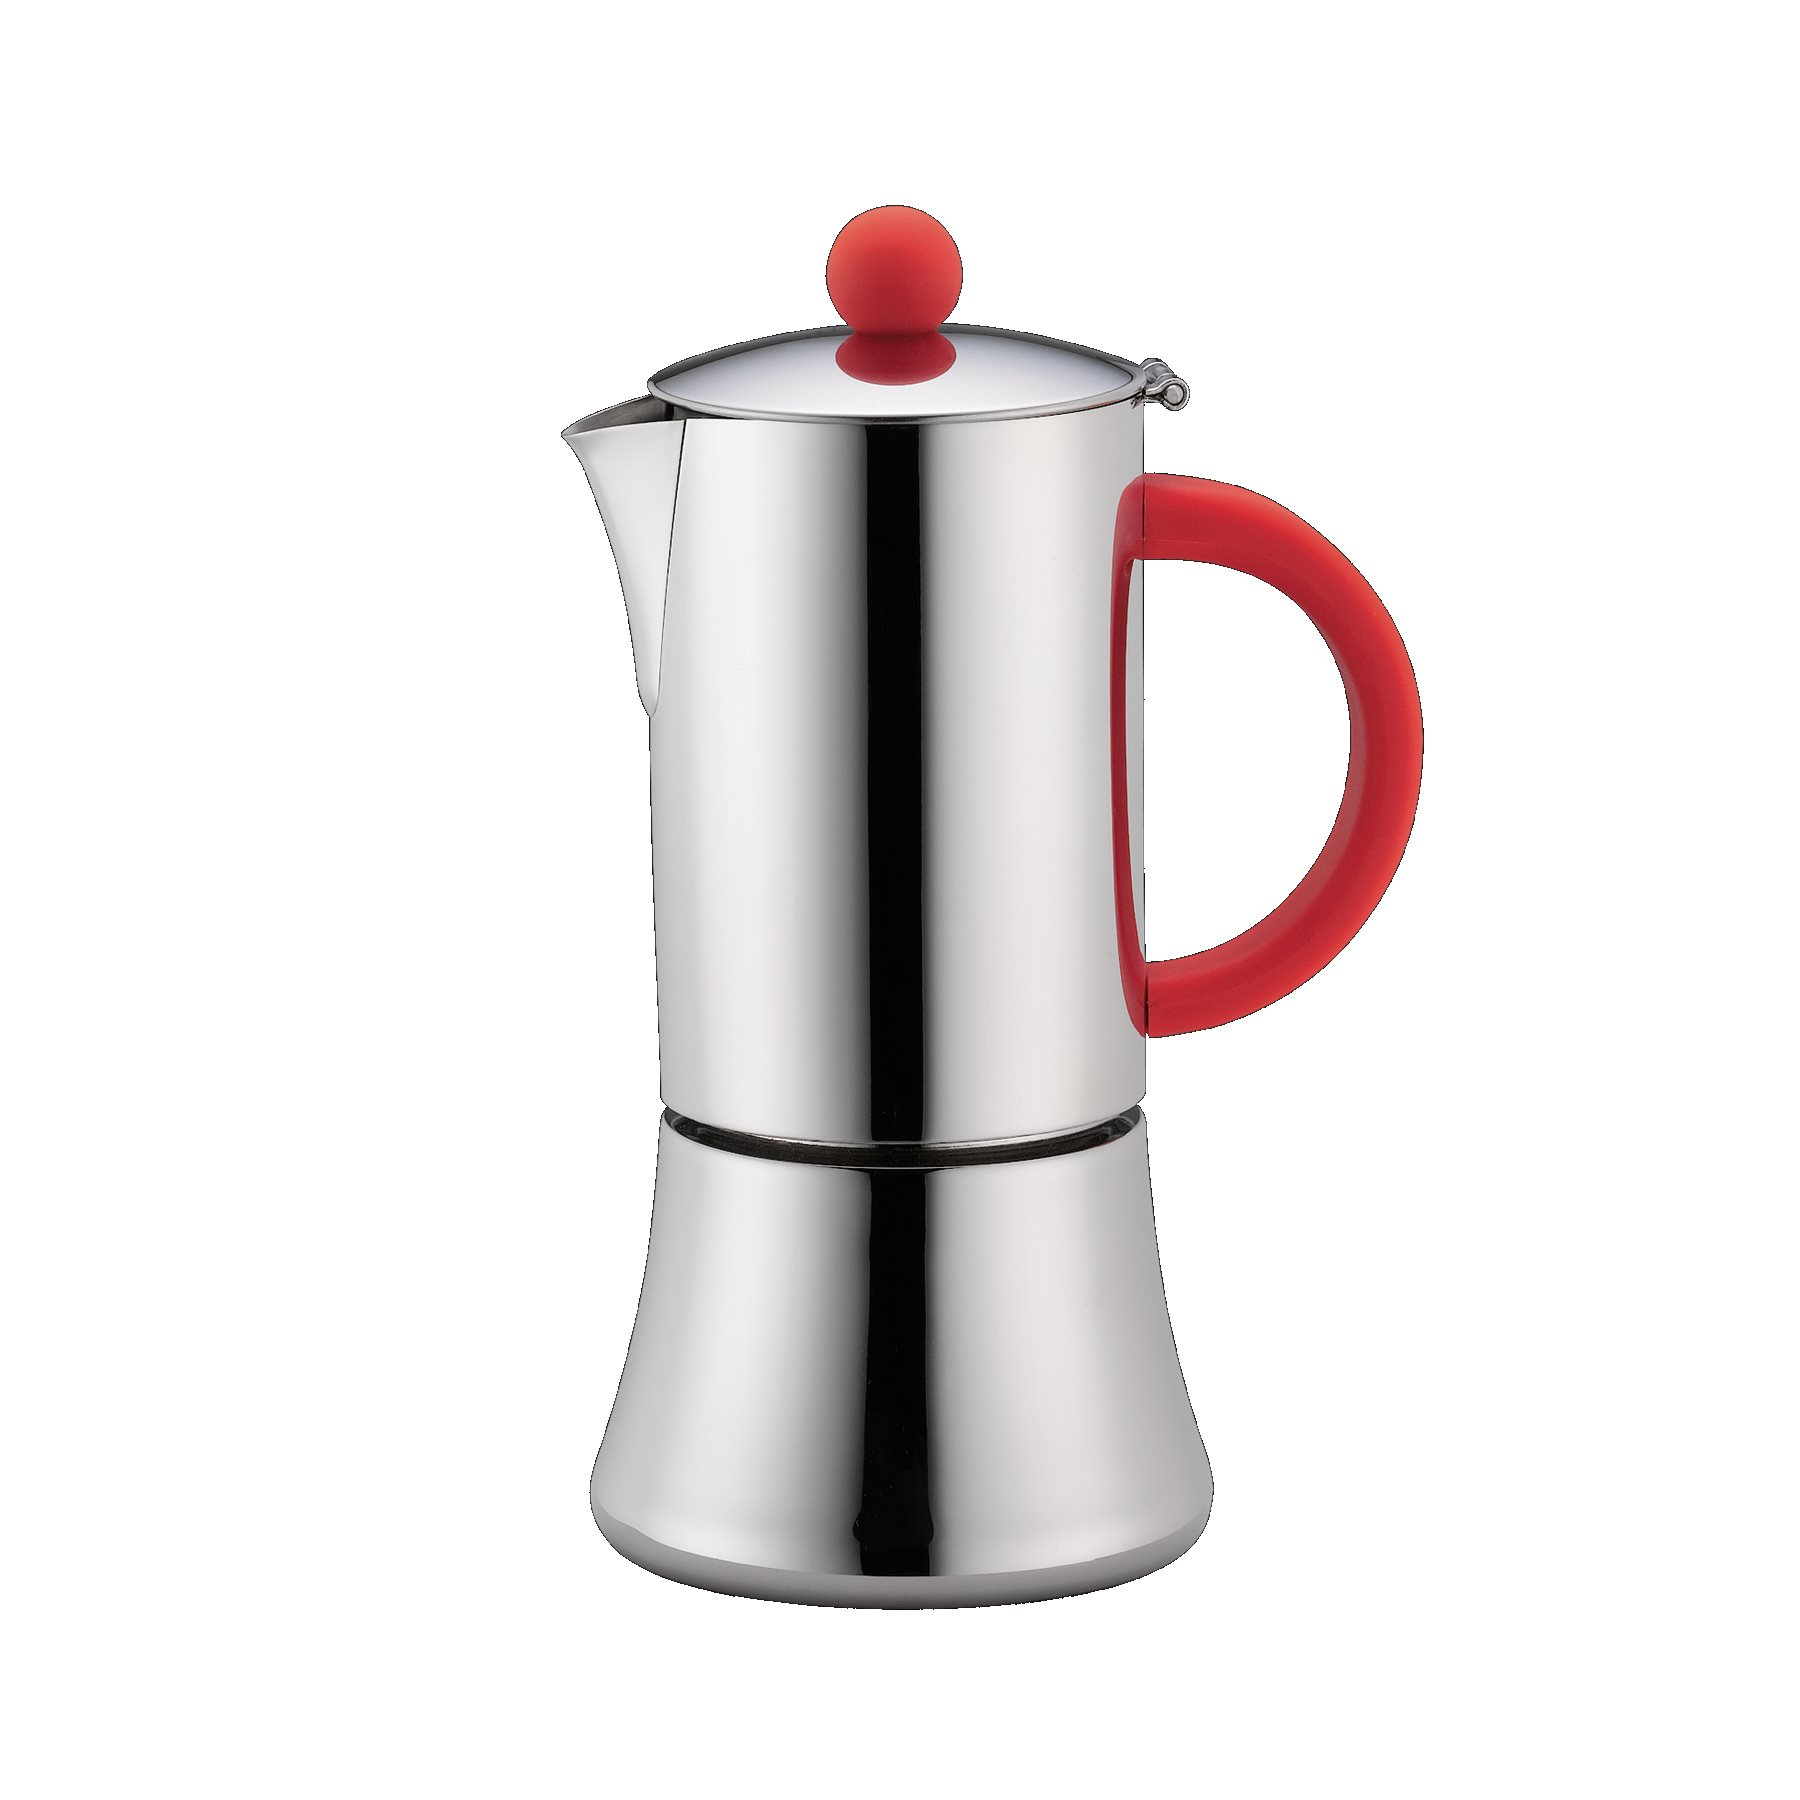 cilio espressokocher tiziano rot 6 tassen edelstahl induktion ebay. Black Bedroom Furniture Sets. Home Design Ideas